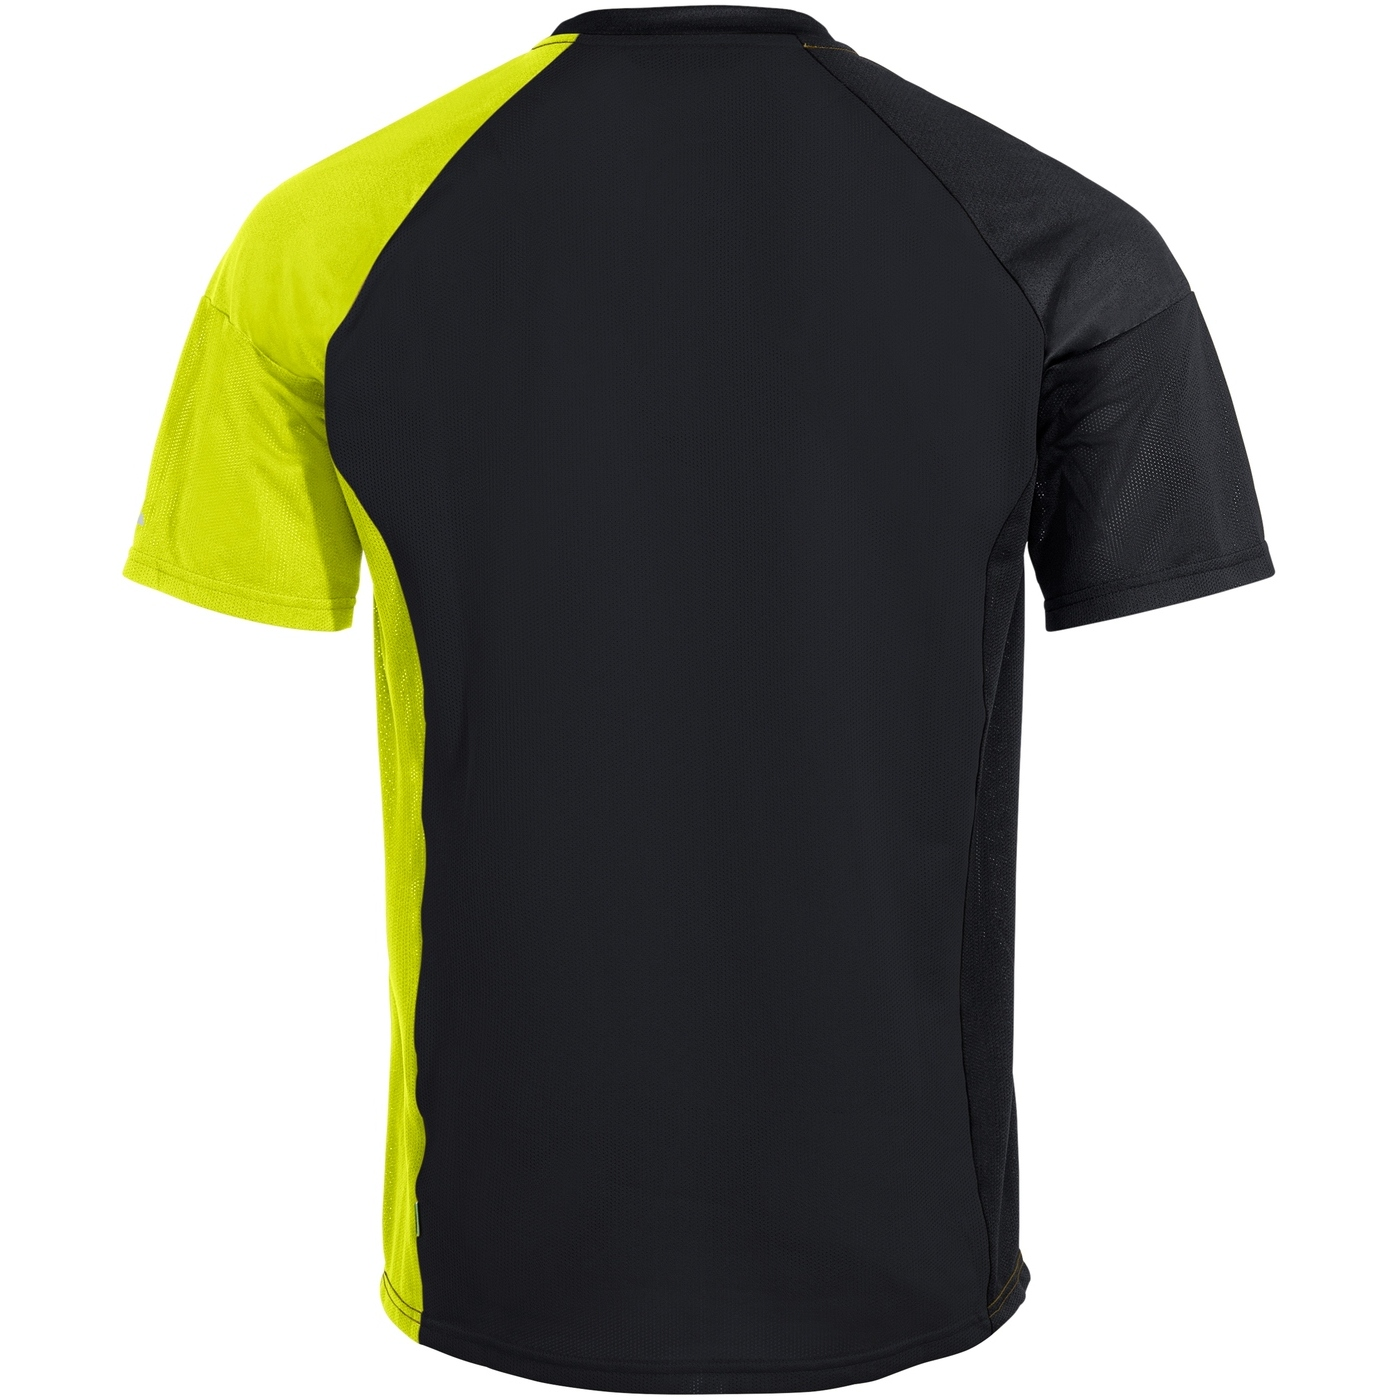 Bild von Vaude Moab T-Shirt VI - avocado